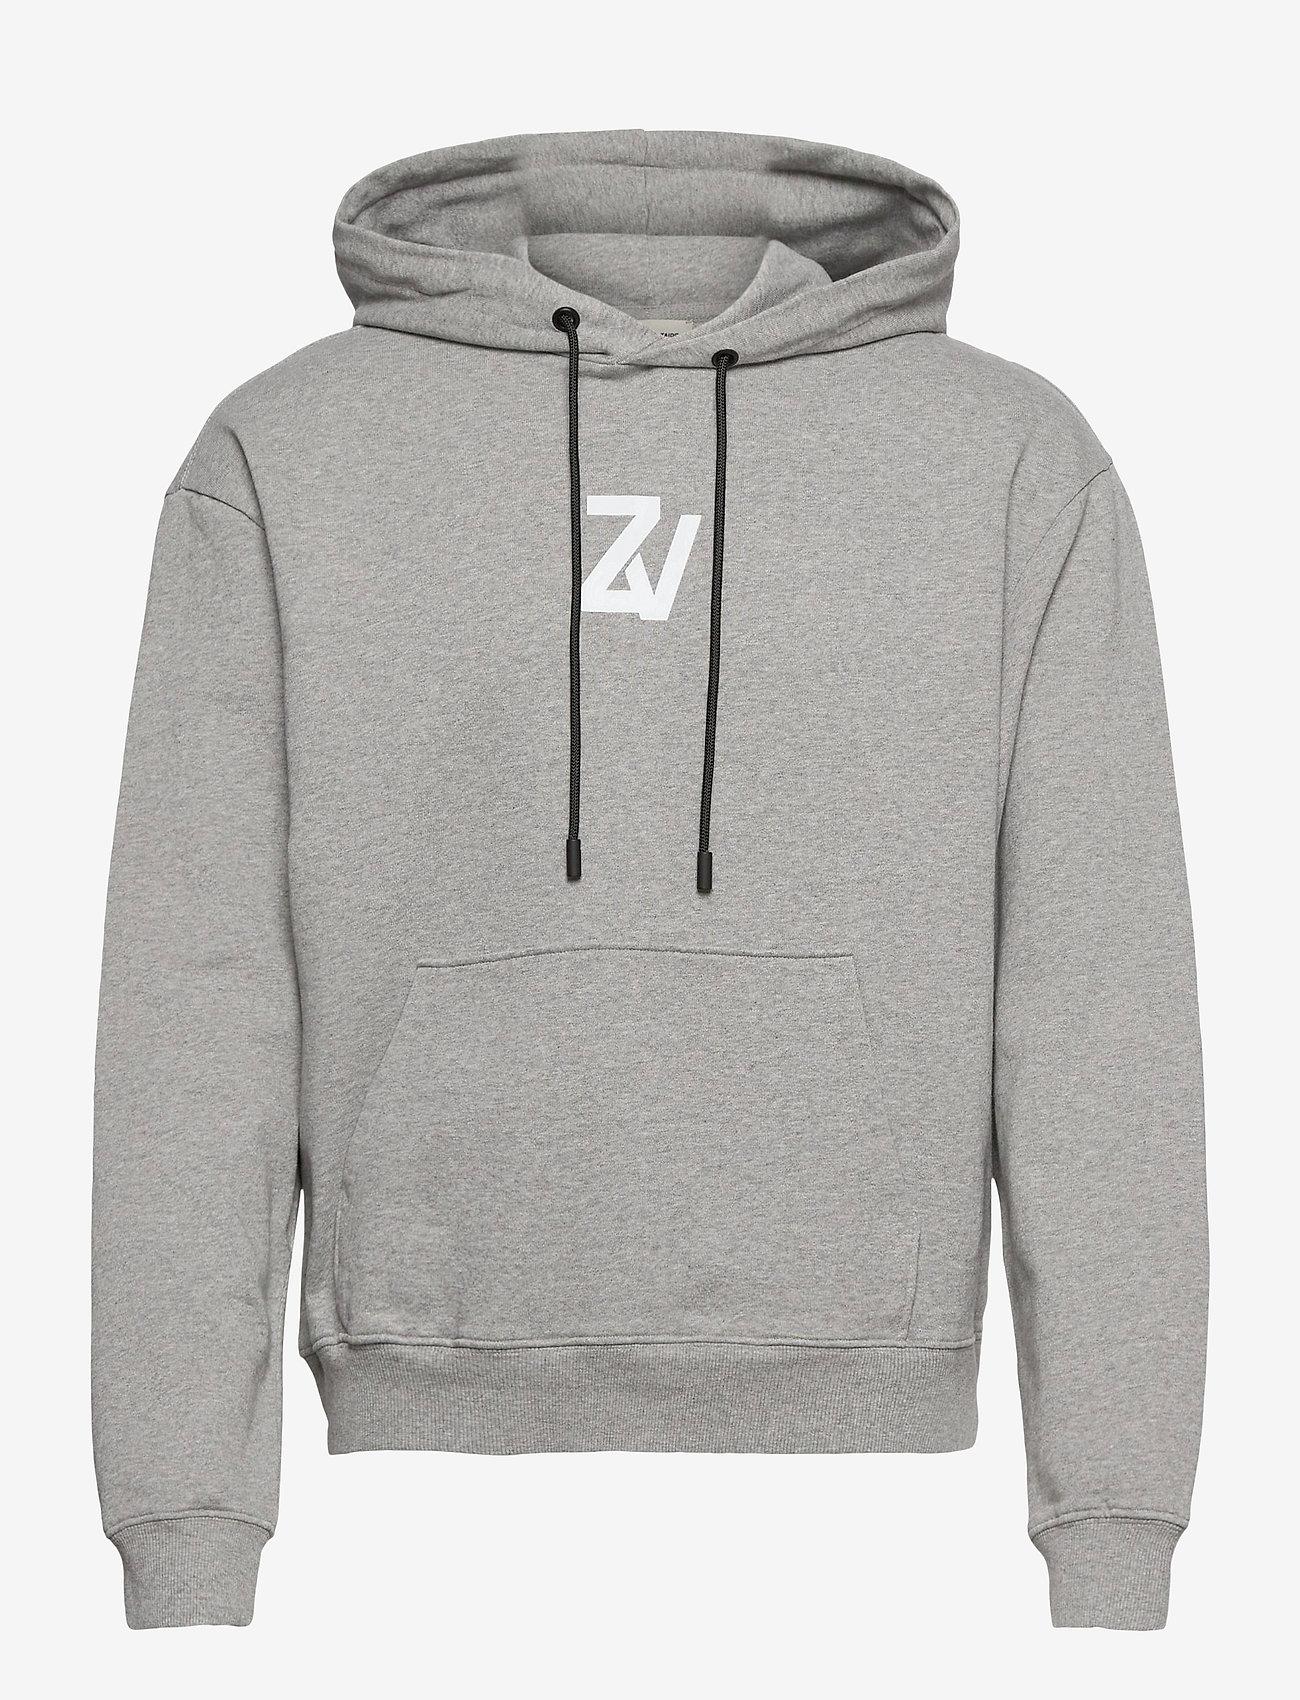 Zadig & Voltaire - STORM MO PHOTOPRINT ZV FACTORY SWEATSHIRT CAPSULE - basic sweatshirts - gris chine clair - 0